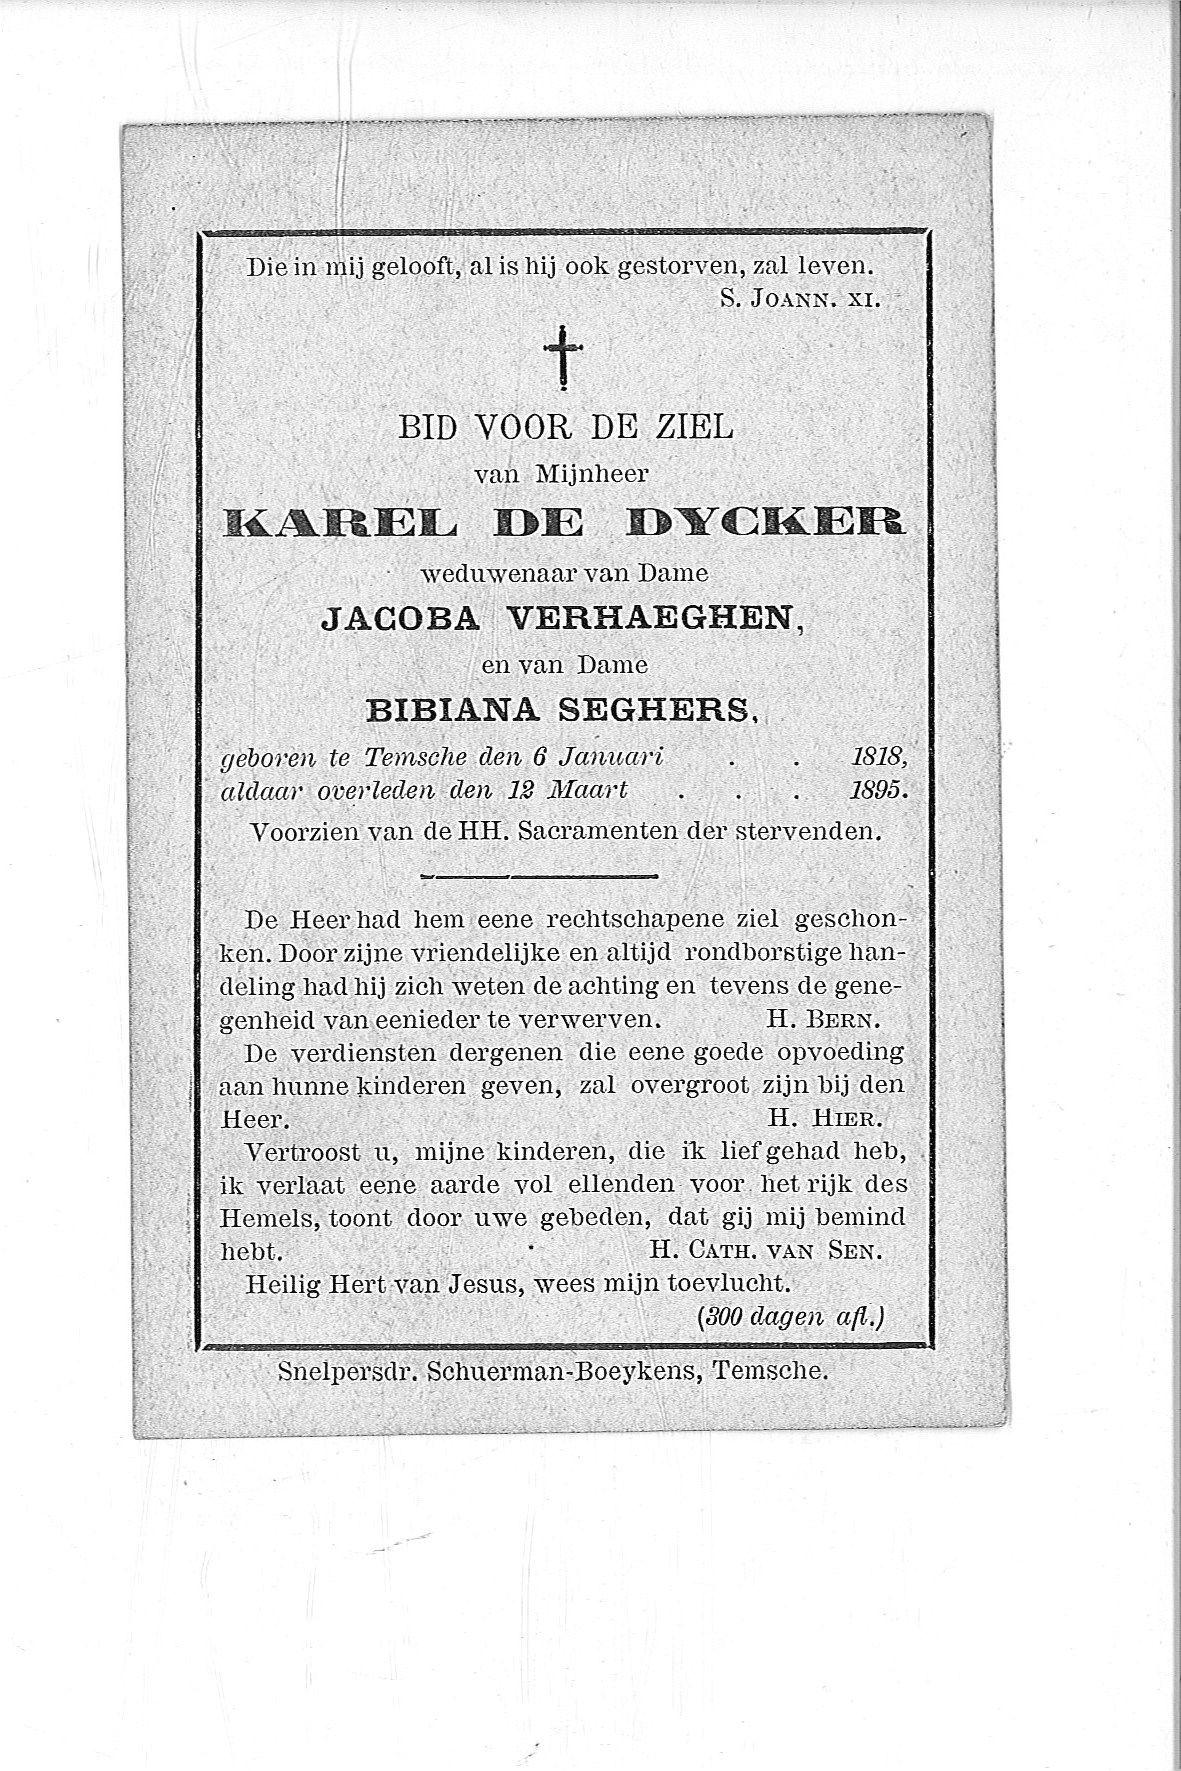 Karel(1895)20090910104716_00018.jpg